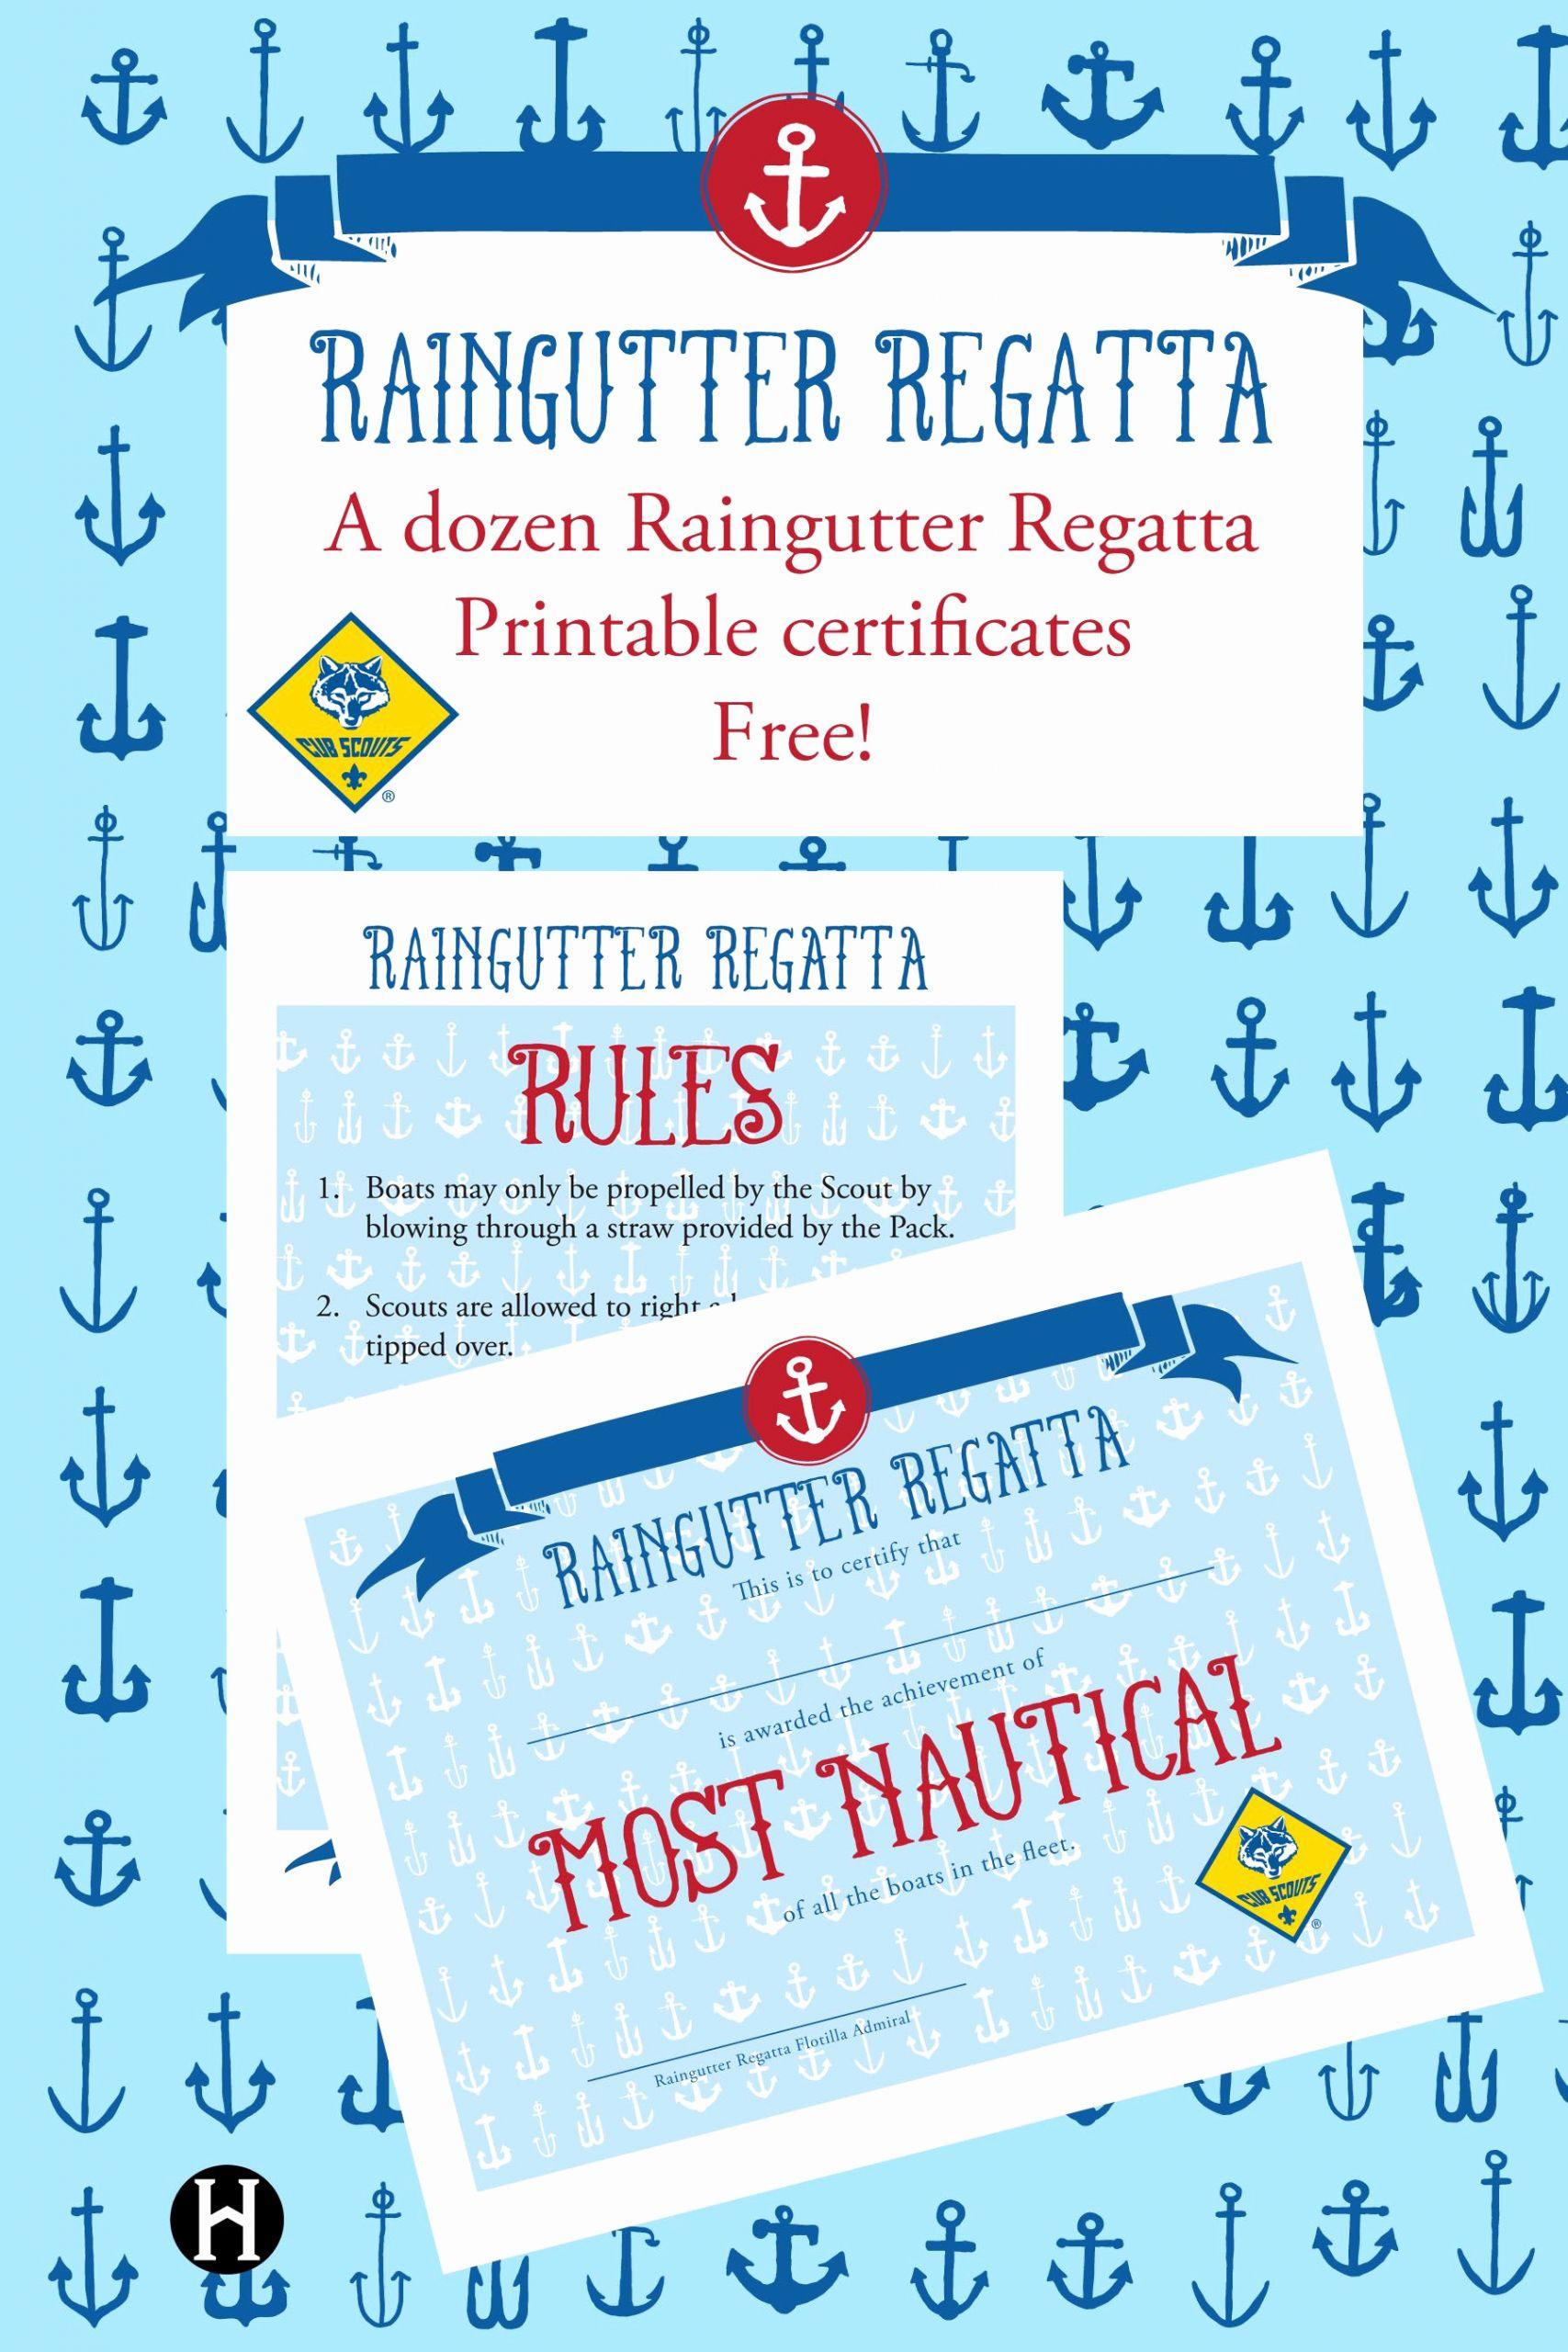 Cub Scout Graduation Certificate Template Beautiful Printable Cub Scout Raingutter Regatta Certificates